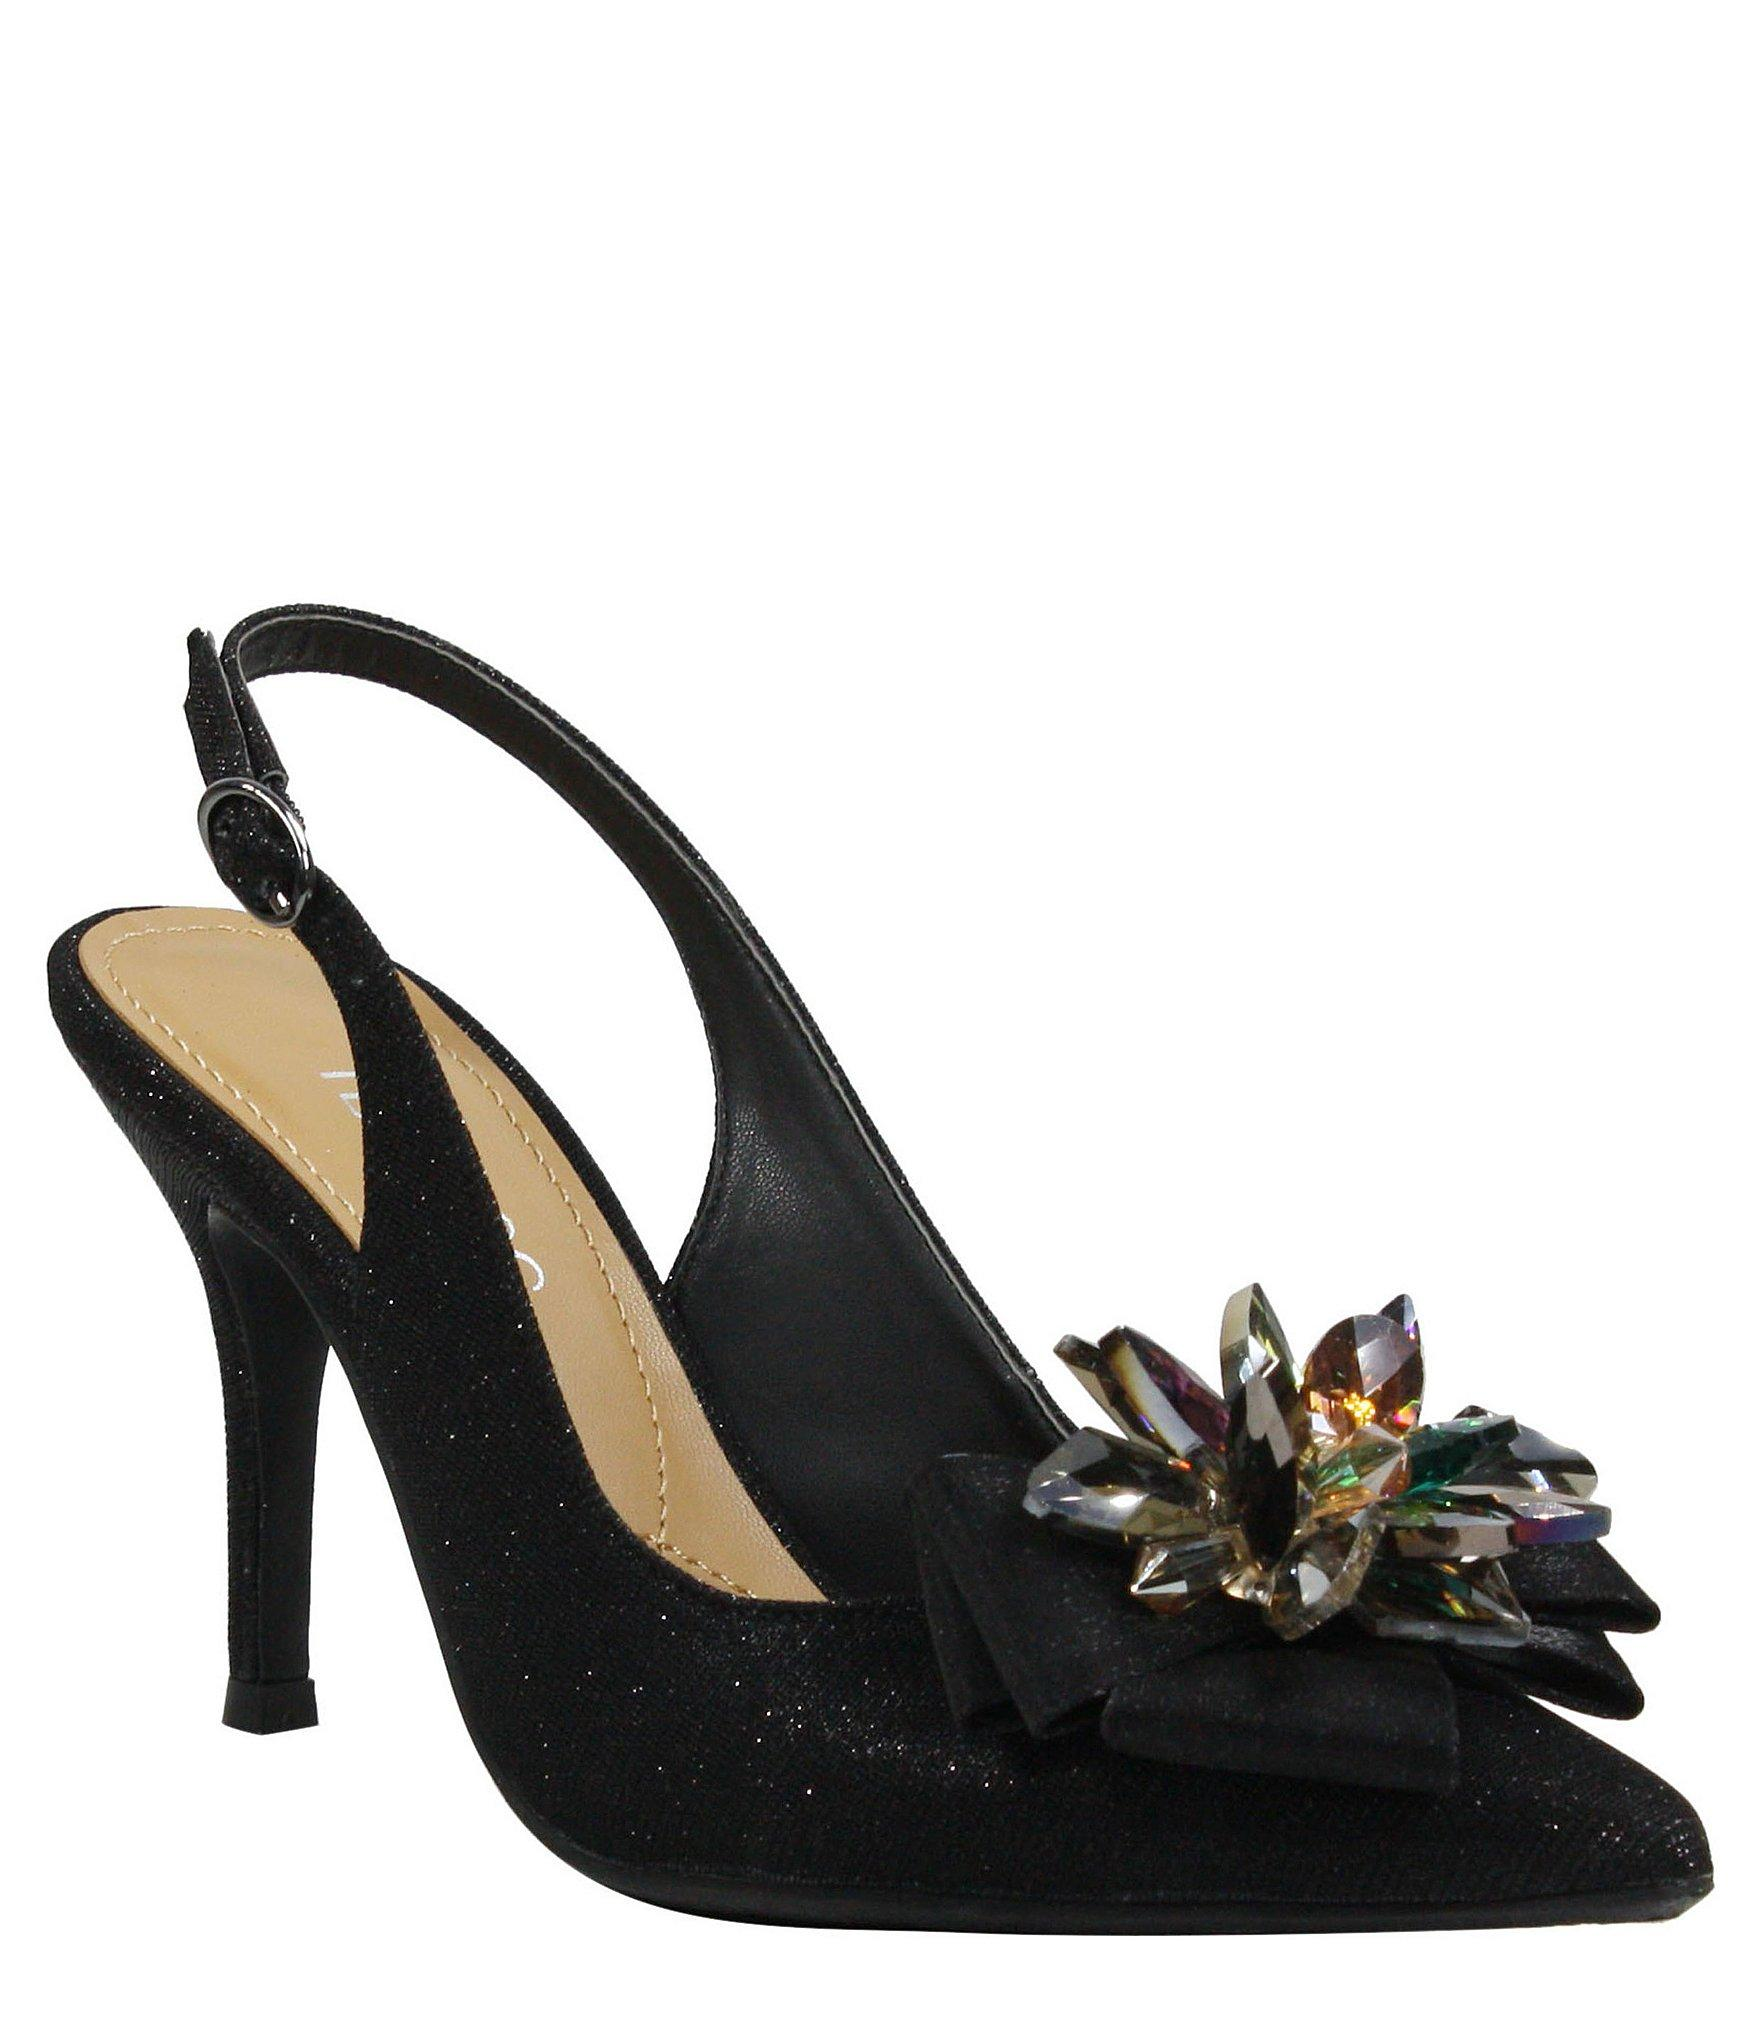 08e65738b69 Lyst - J. Reneé Denyell Glitter Flower Ornament Sling Pumps in Black